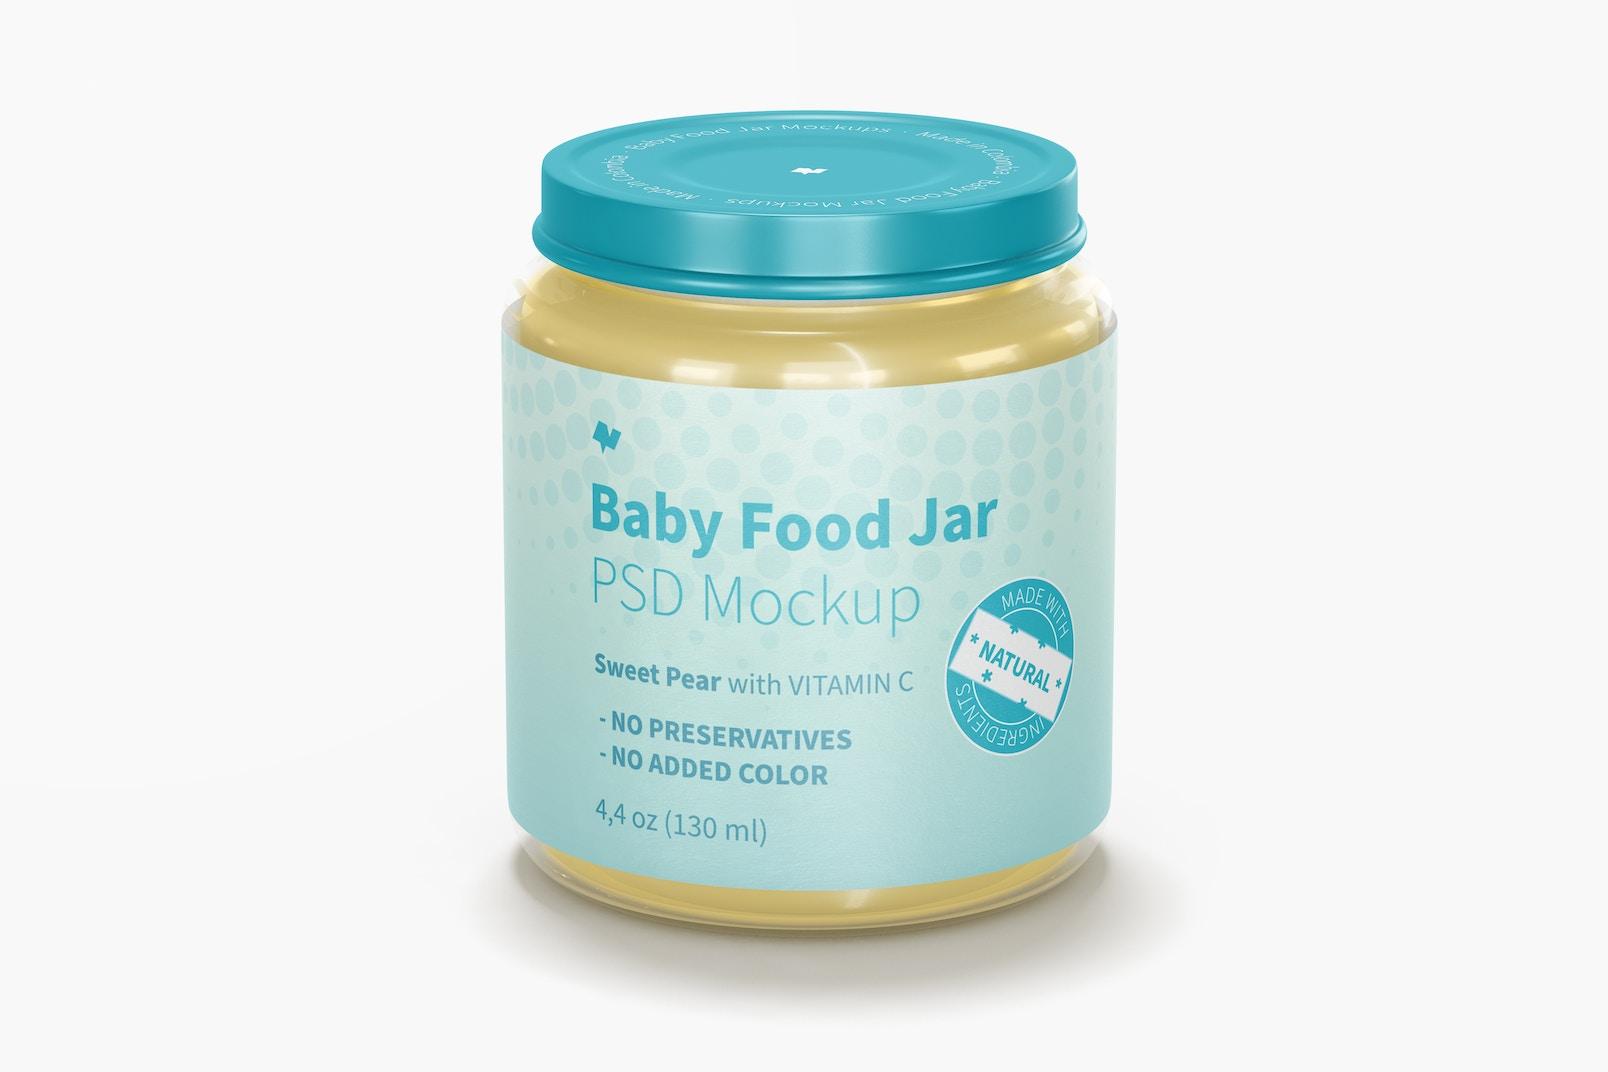 Baby Food Jar Mockup, Front View